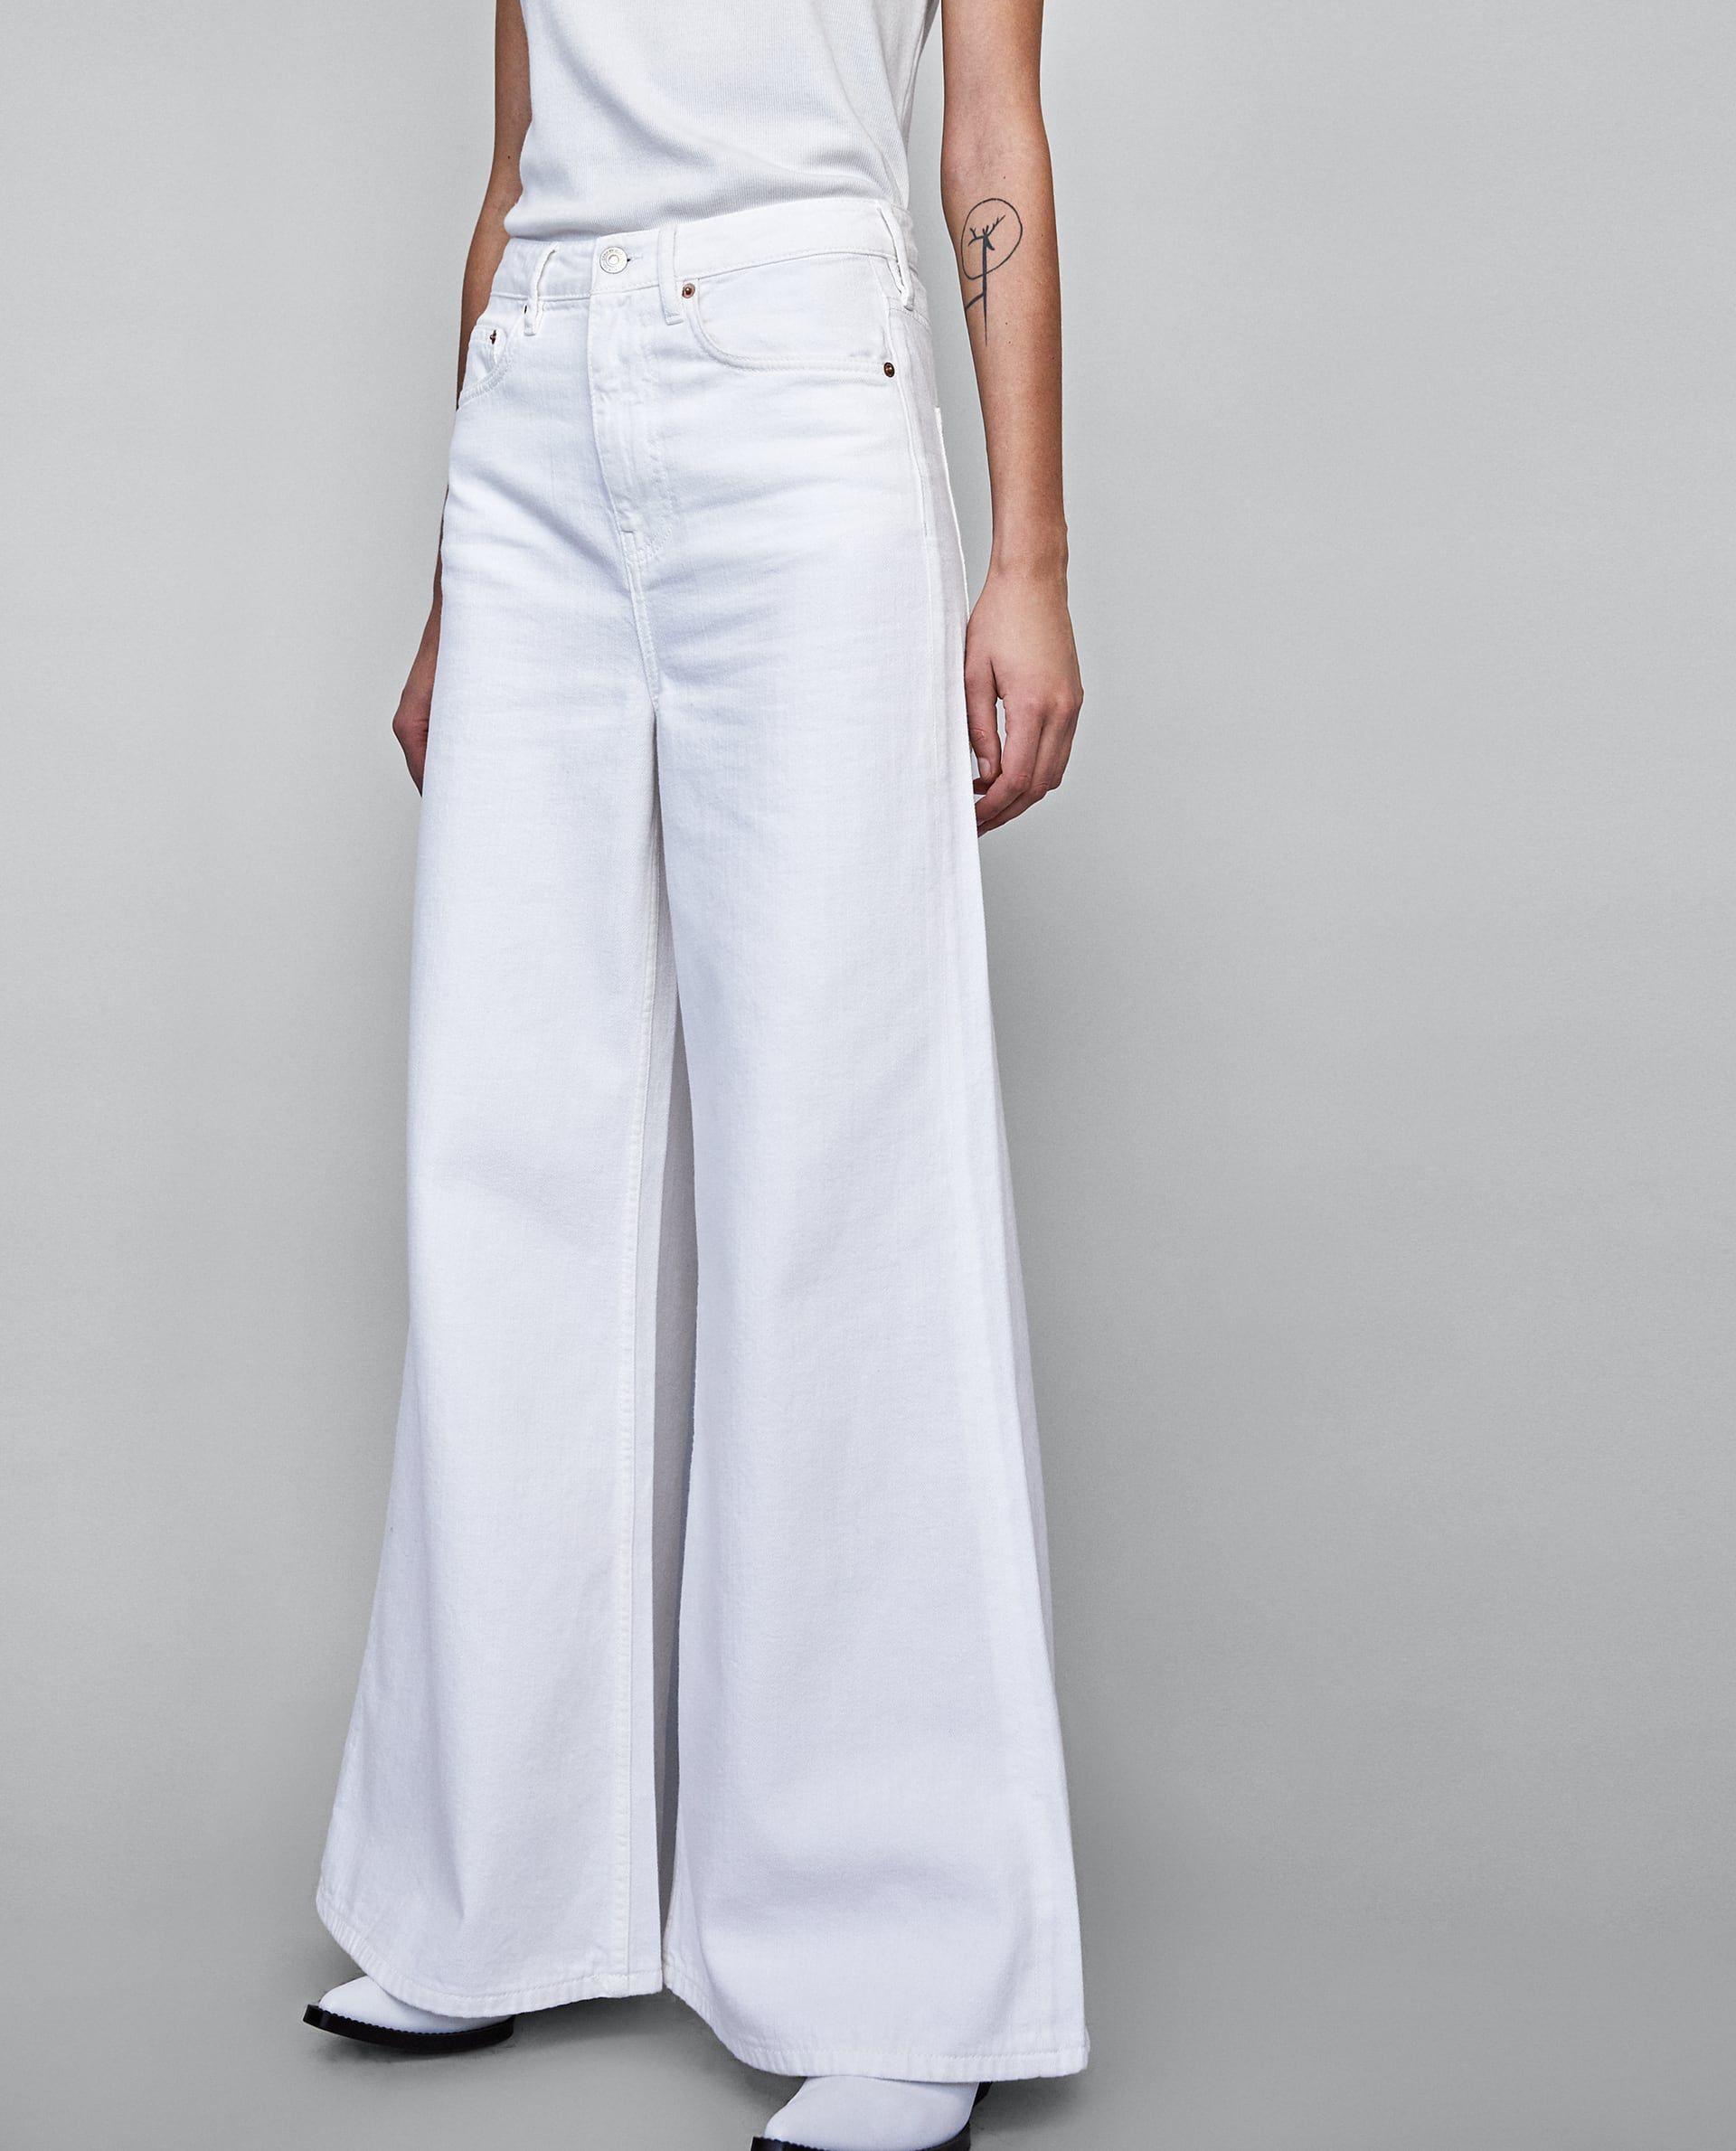 Vintage Yuksek Bel Ispanyol Paca Jean Zara Flare Jeans Fashion